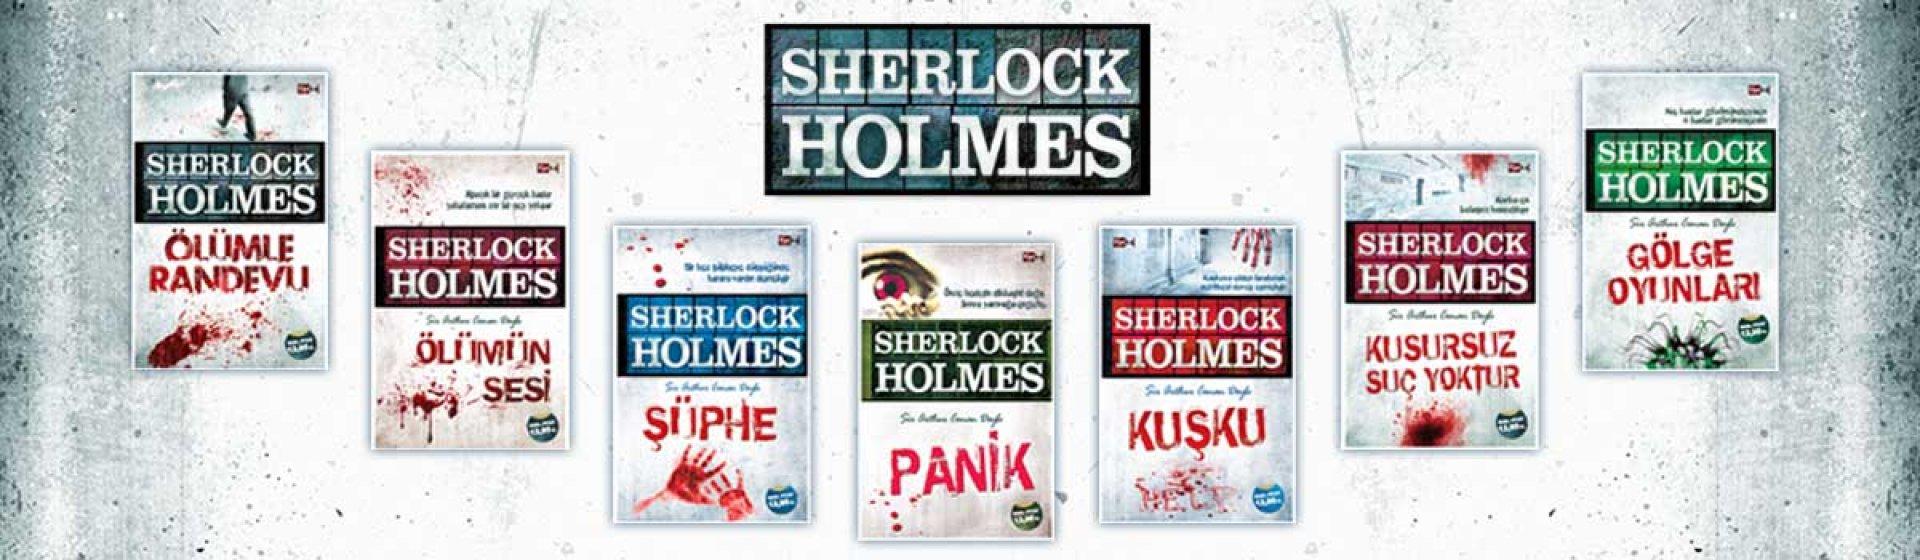 Sherlock Holmes Banner